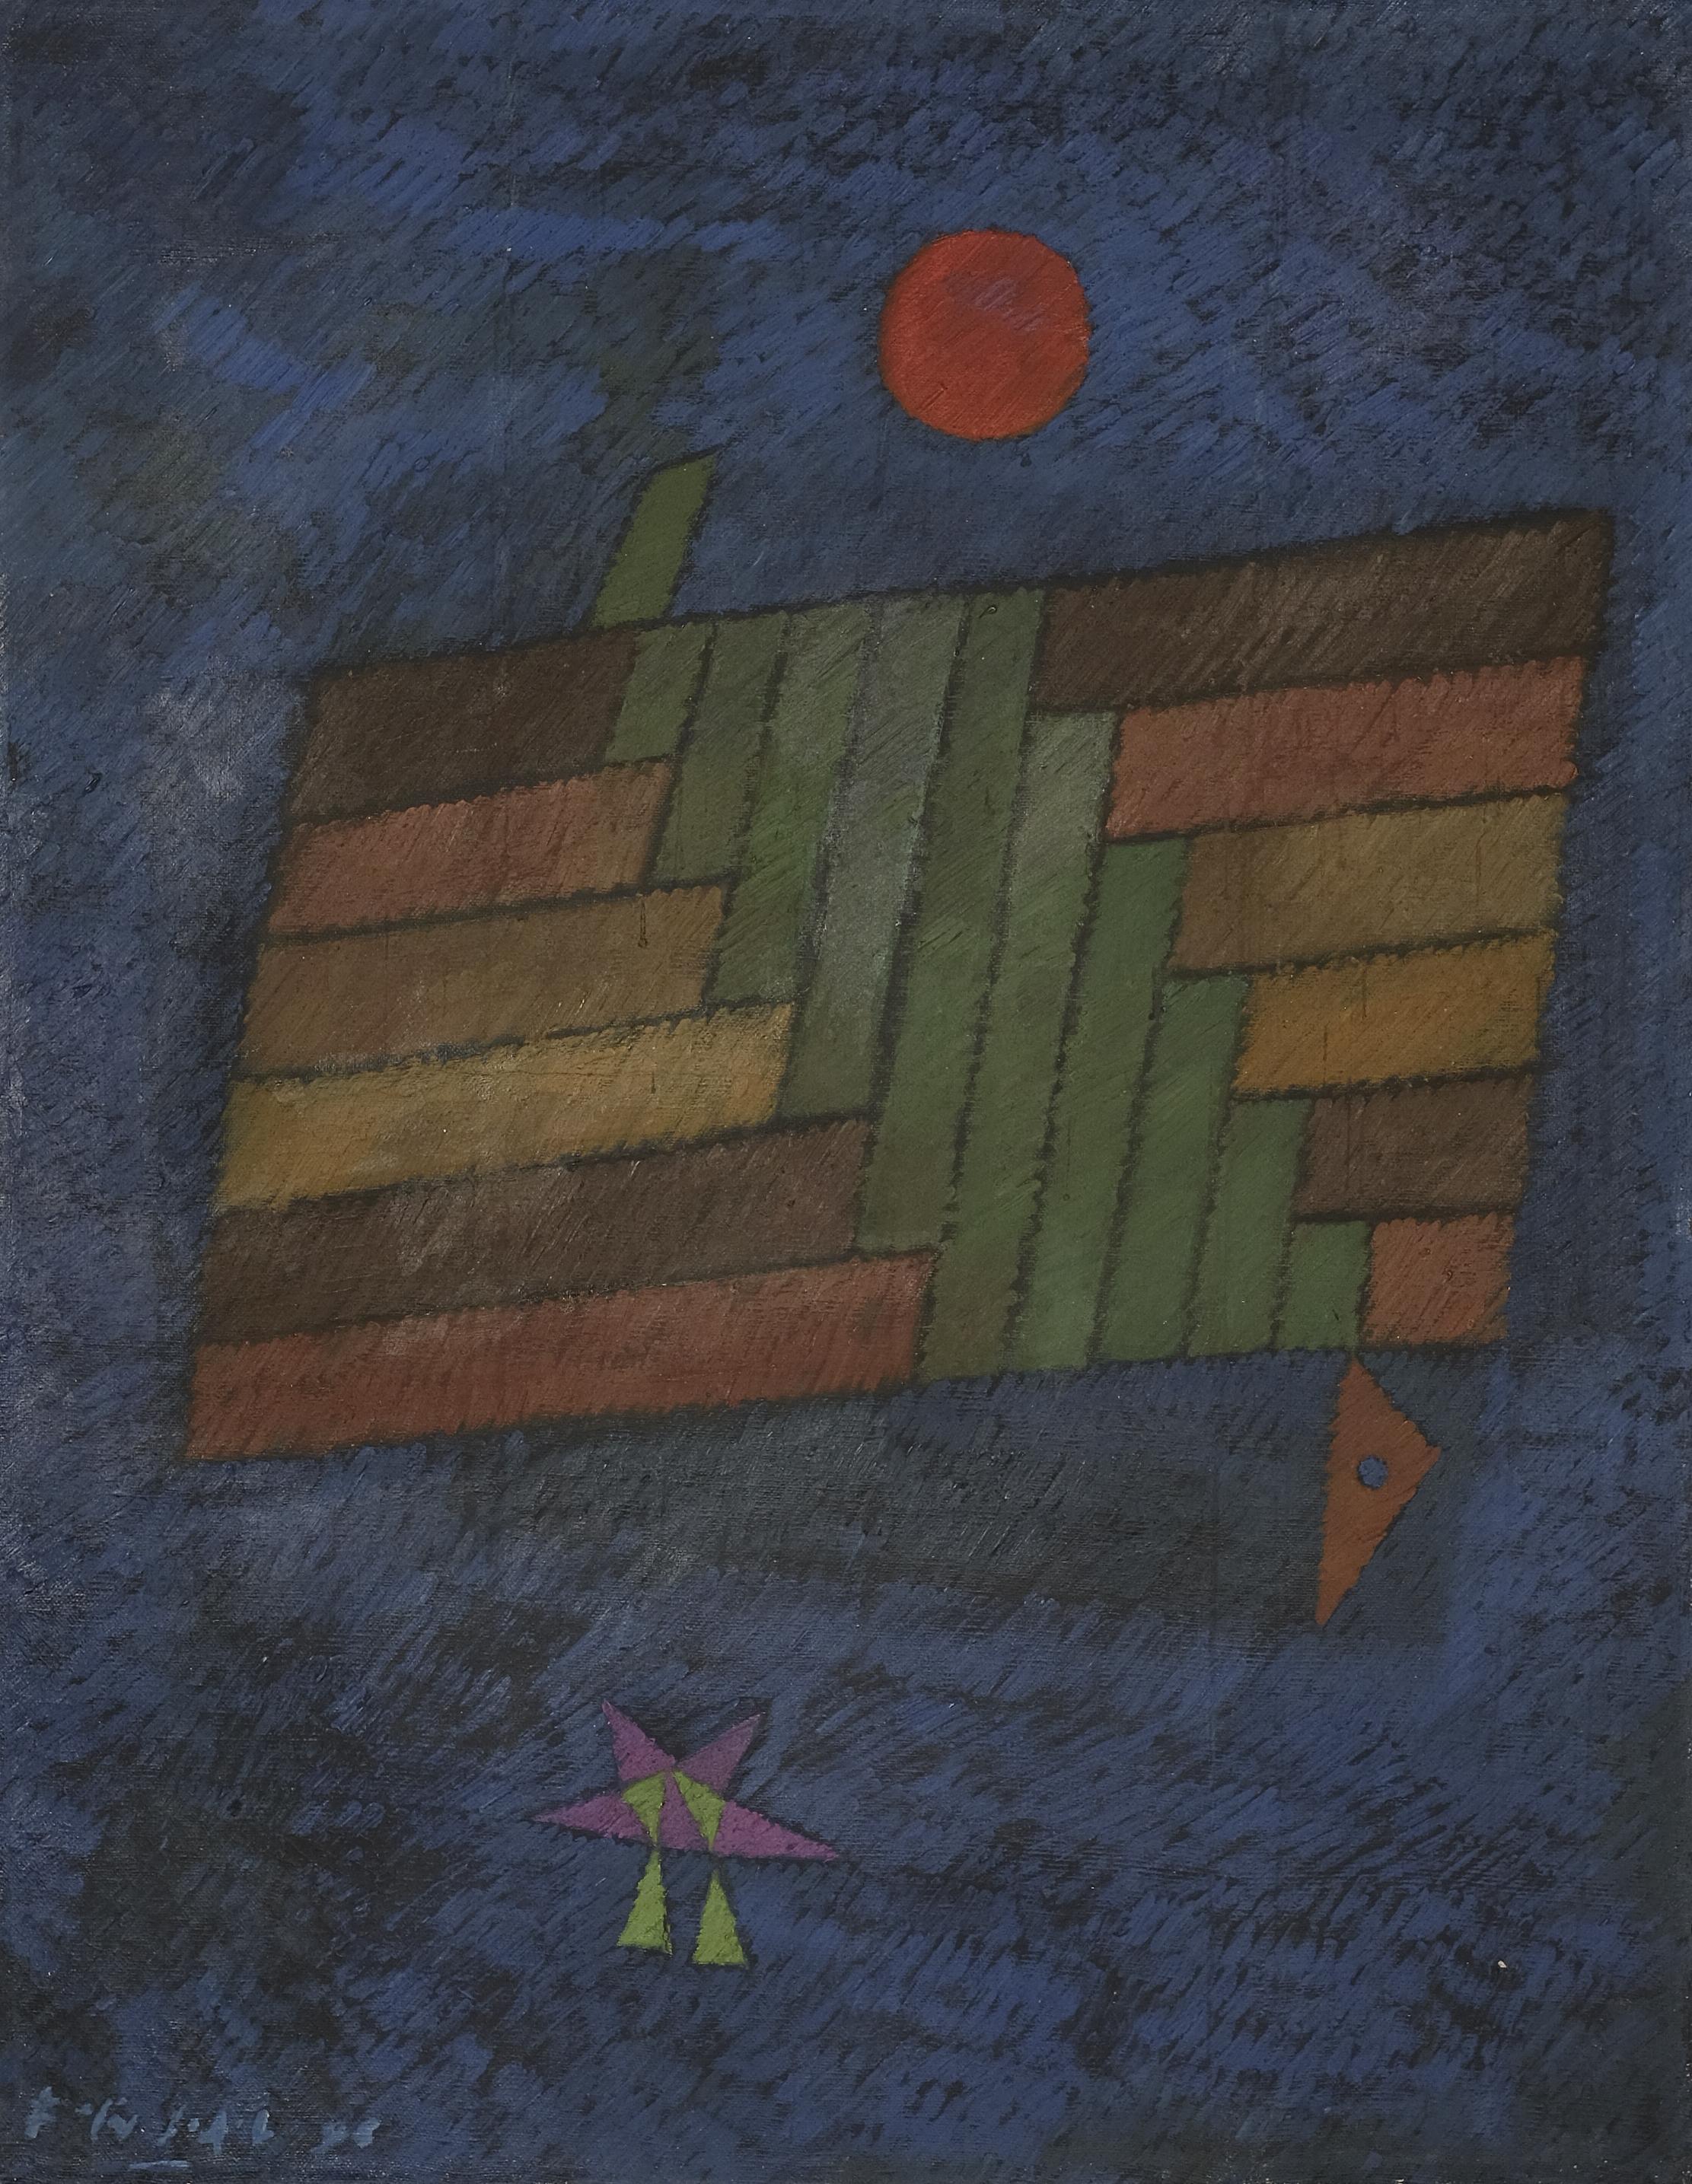 Fadjar Sidik, Dinamika Keruangan (Space Dynamics), ooc, 90 x 70 cm, 1971.jpeg